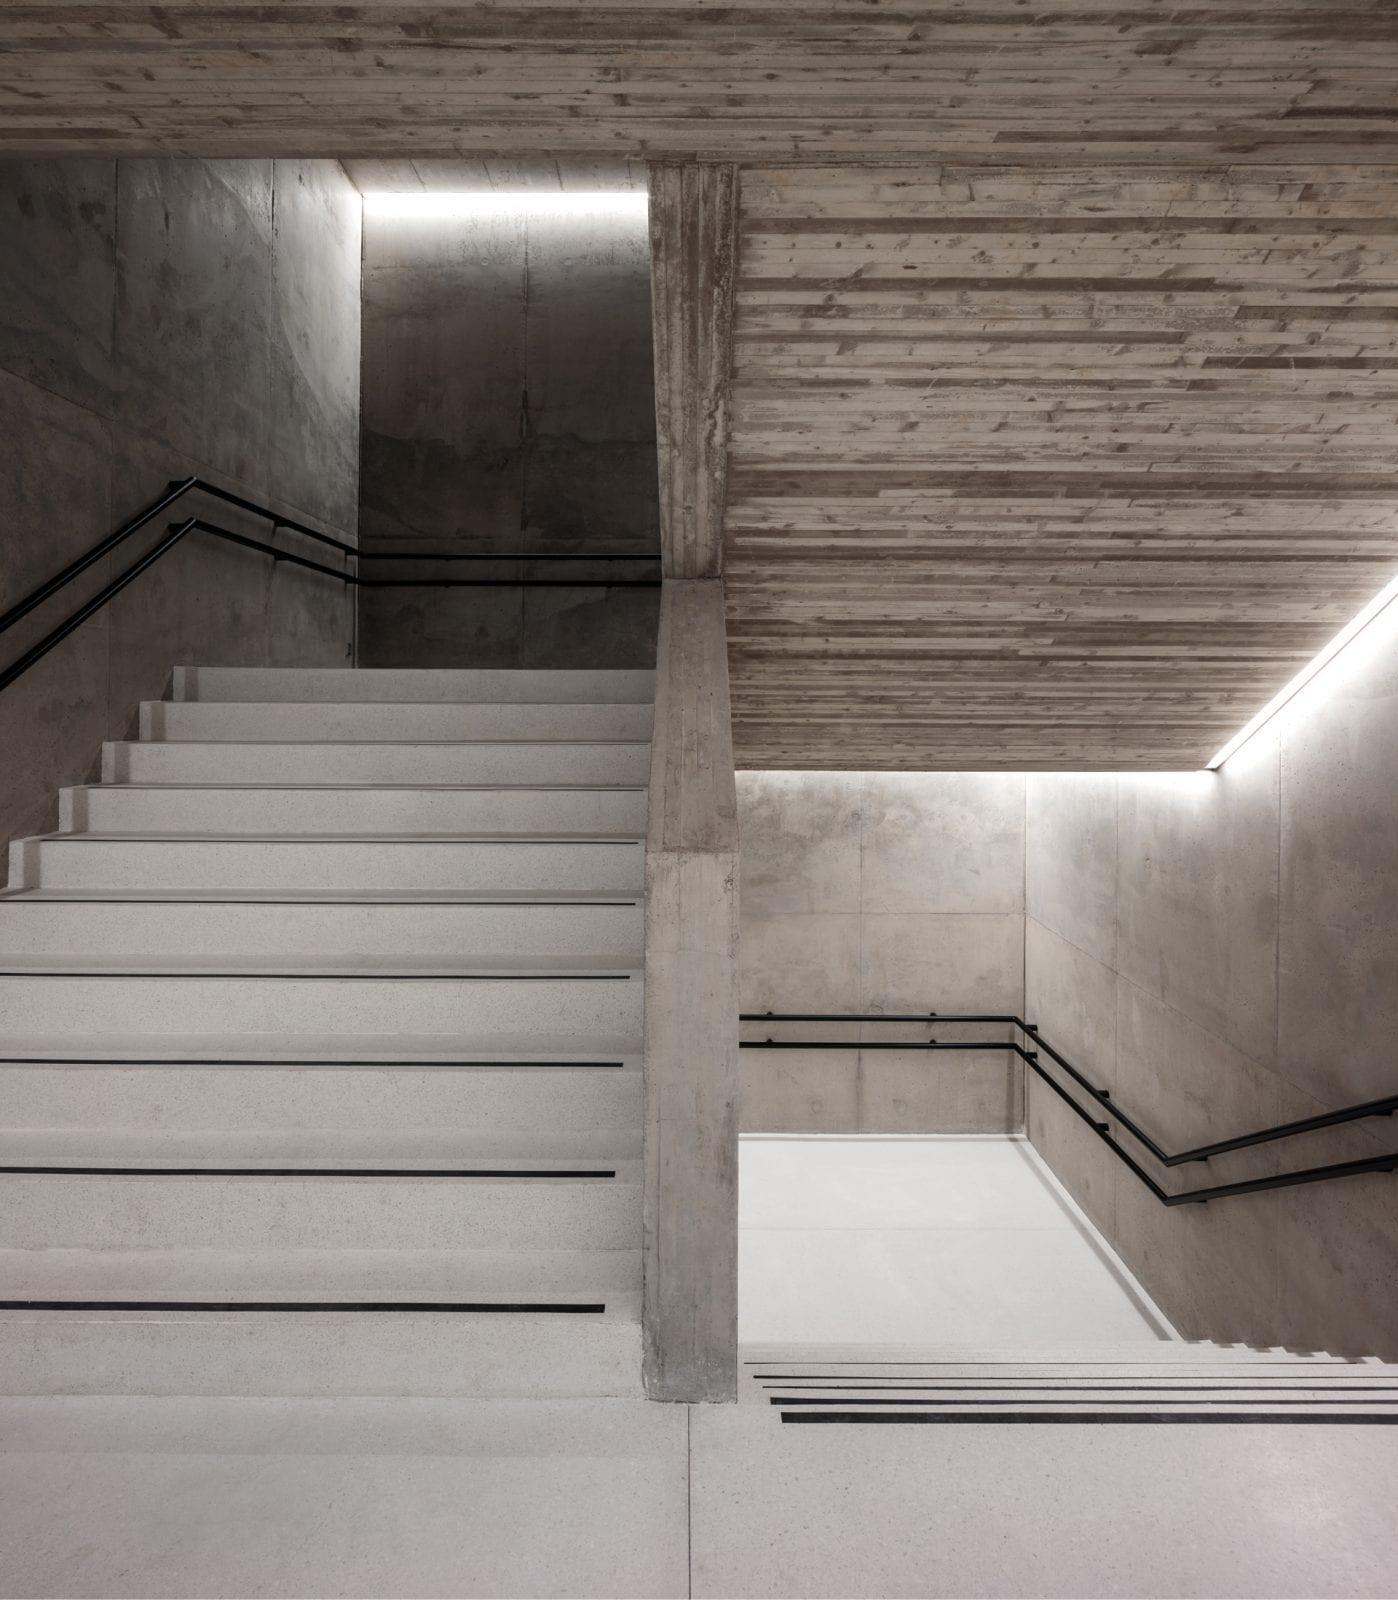 Ein Treppenhaus im modernisierten Olympiastadion Helsinki (Foto: Tuomas Uusheimo)